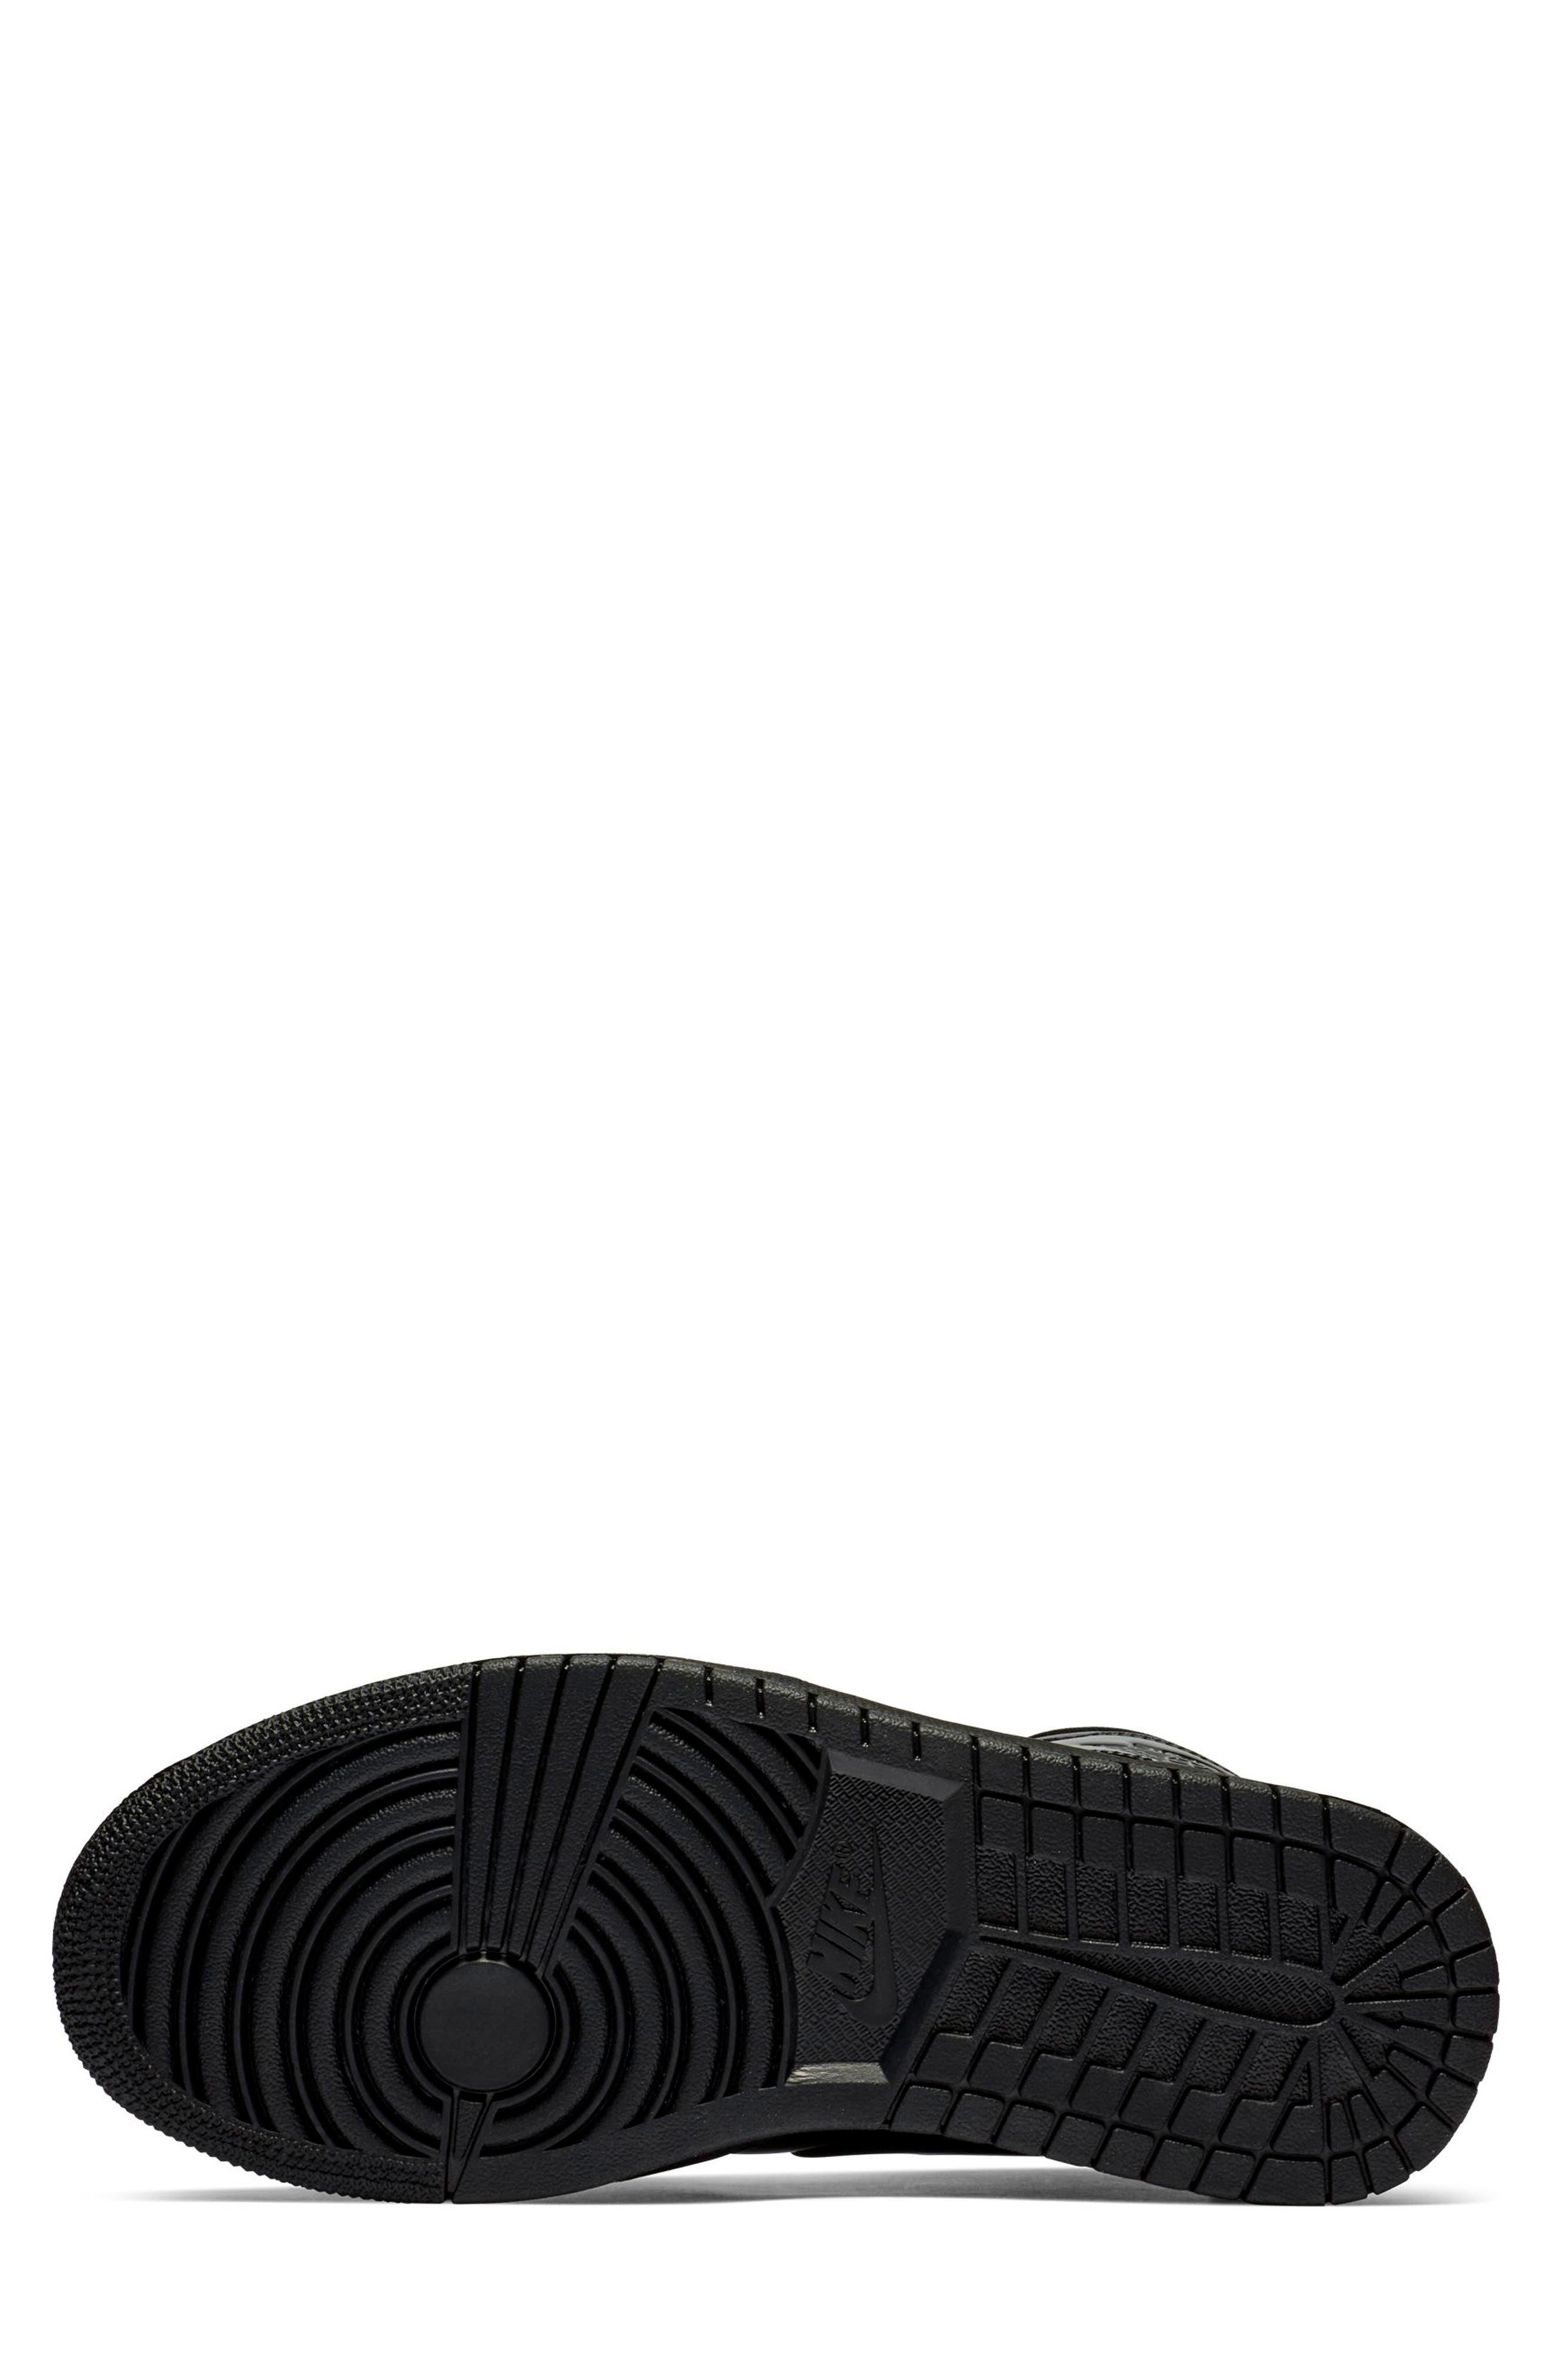 JORDAN, Nike Air Jordan 1 Mid Sneaker, Alternate thumbnail 5, color, BLACK/ BLACK/ BLACK